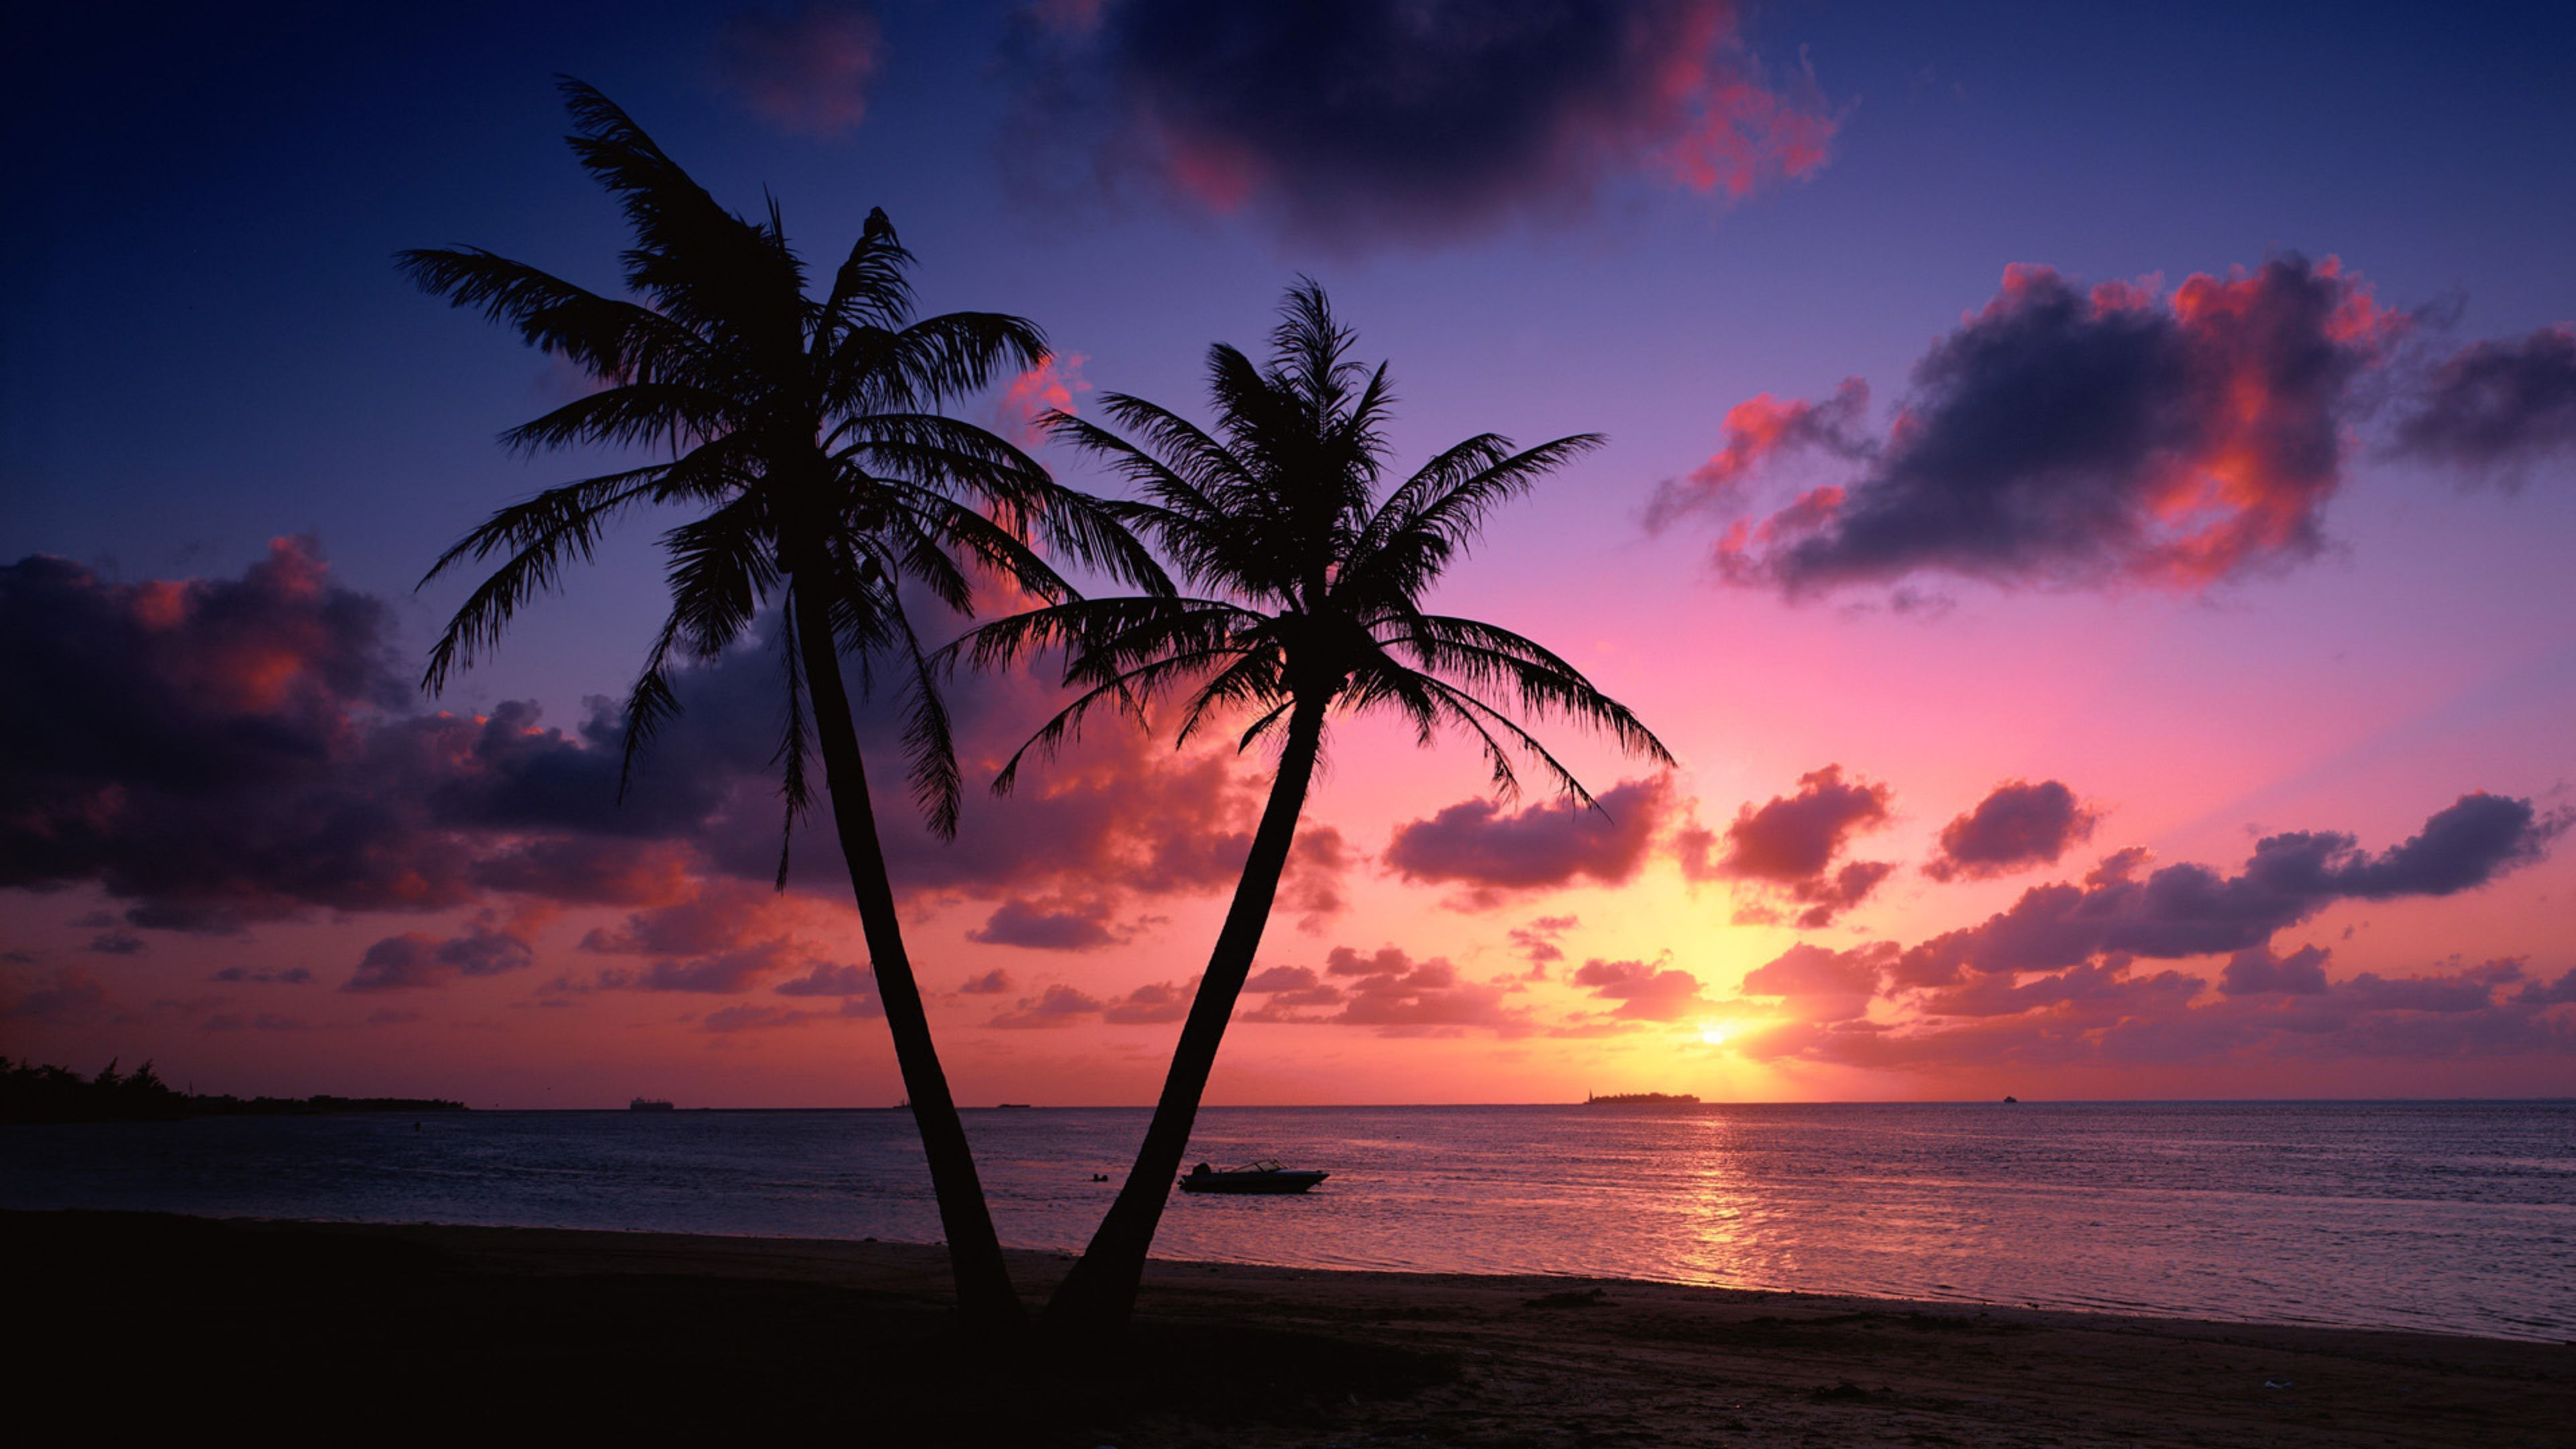 Beach Sunset Live Wallpaper ,goa, India - Palm Tree Beach Sunset , HD Wallpaper & Backgrounds